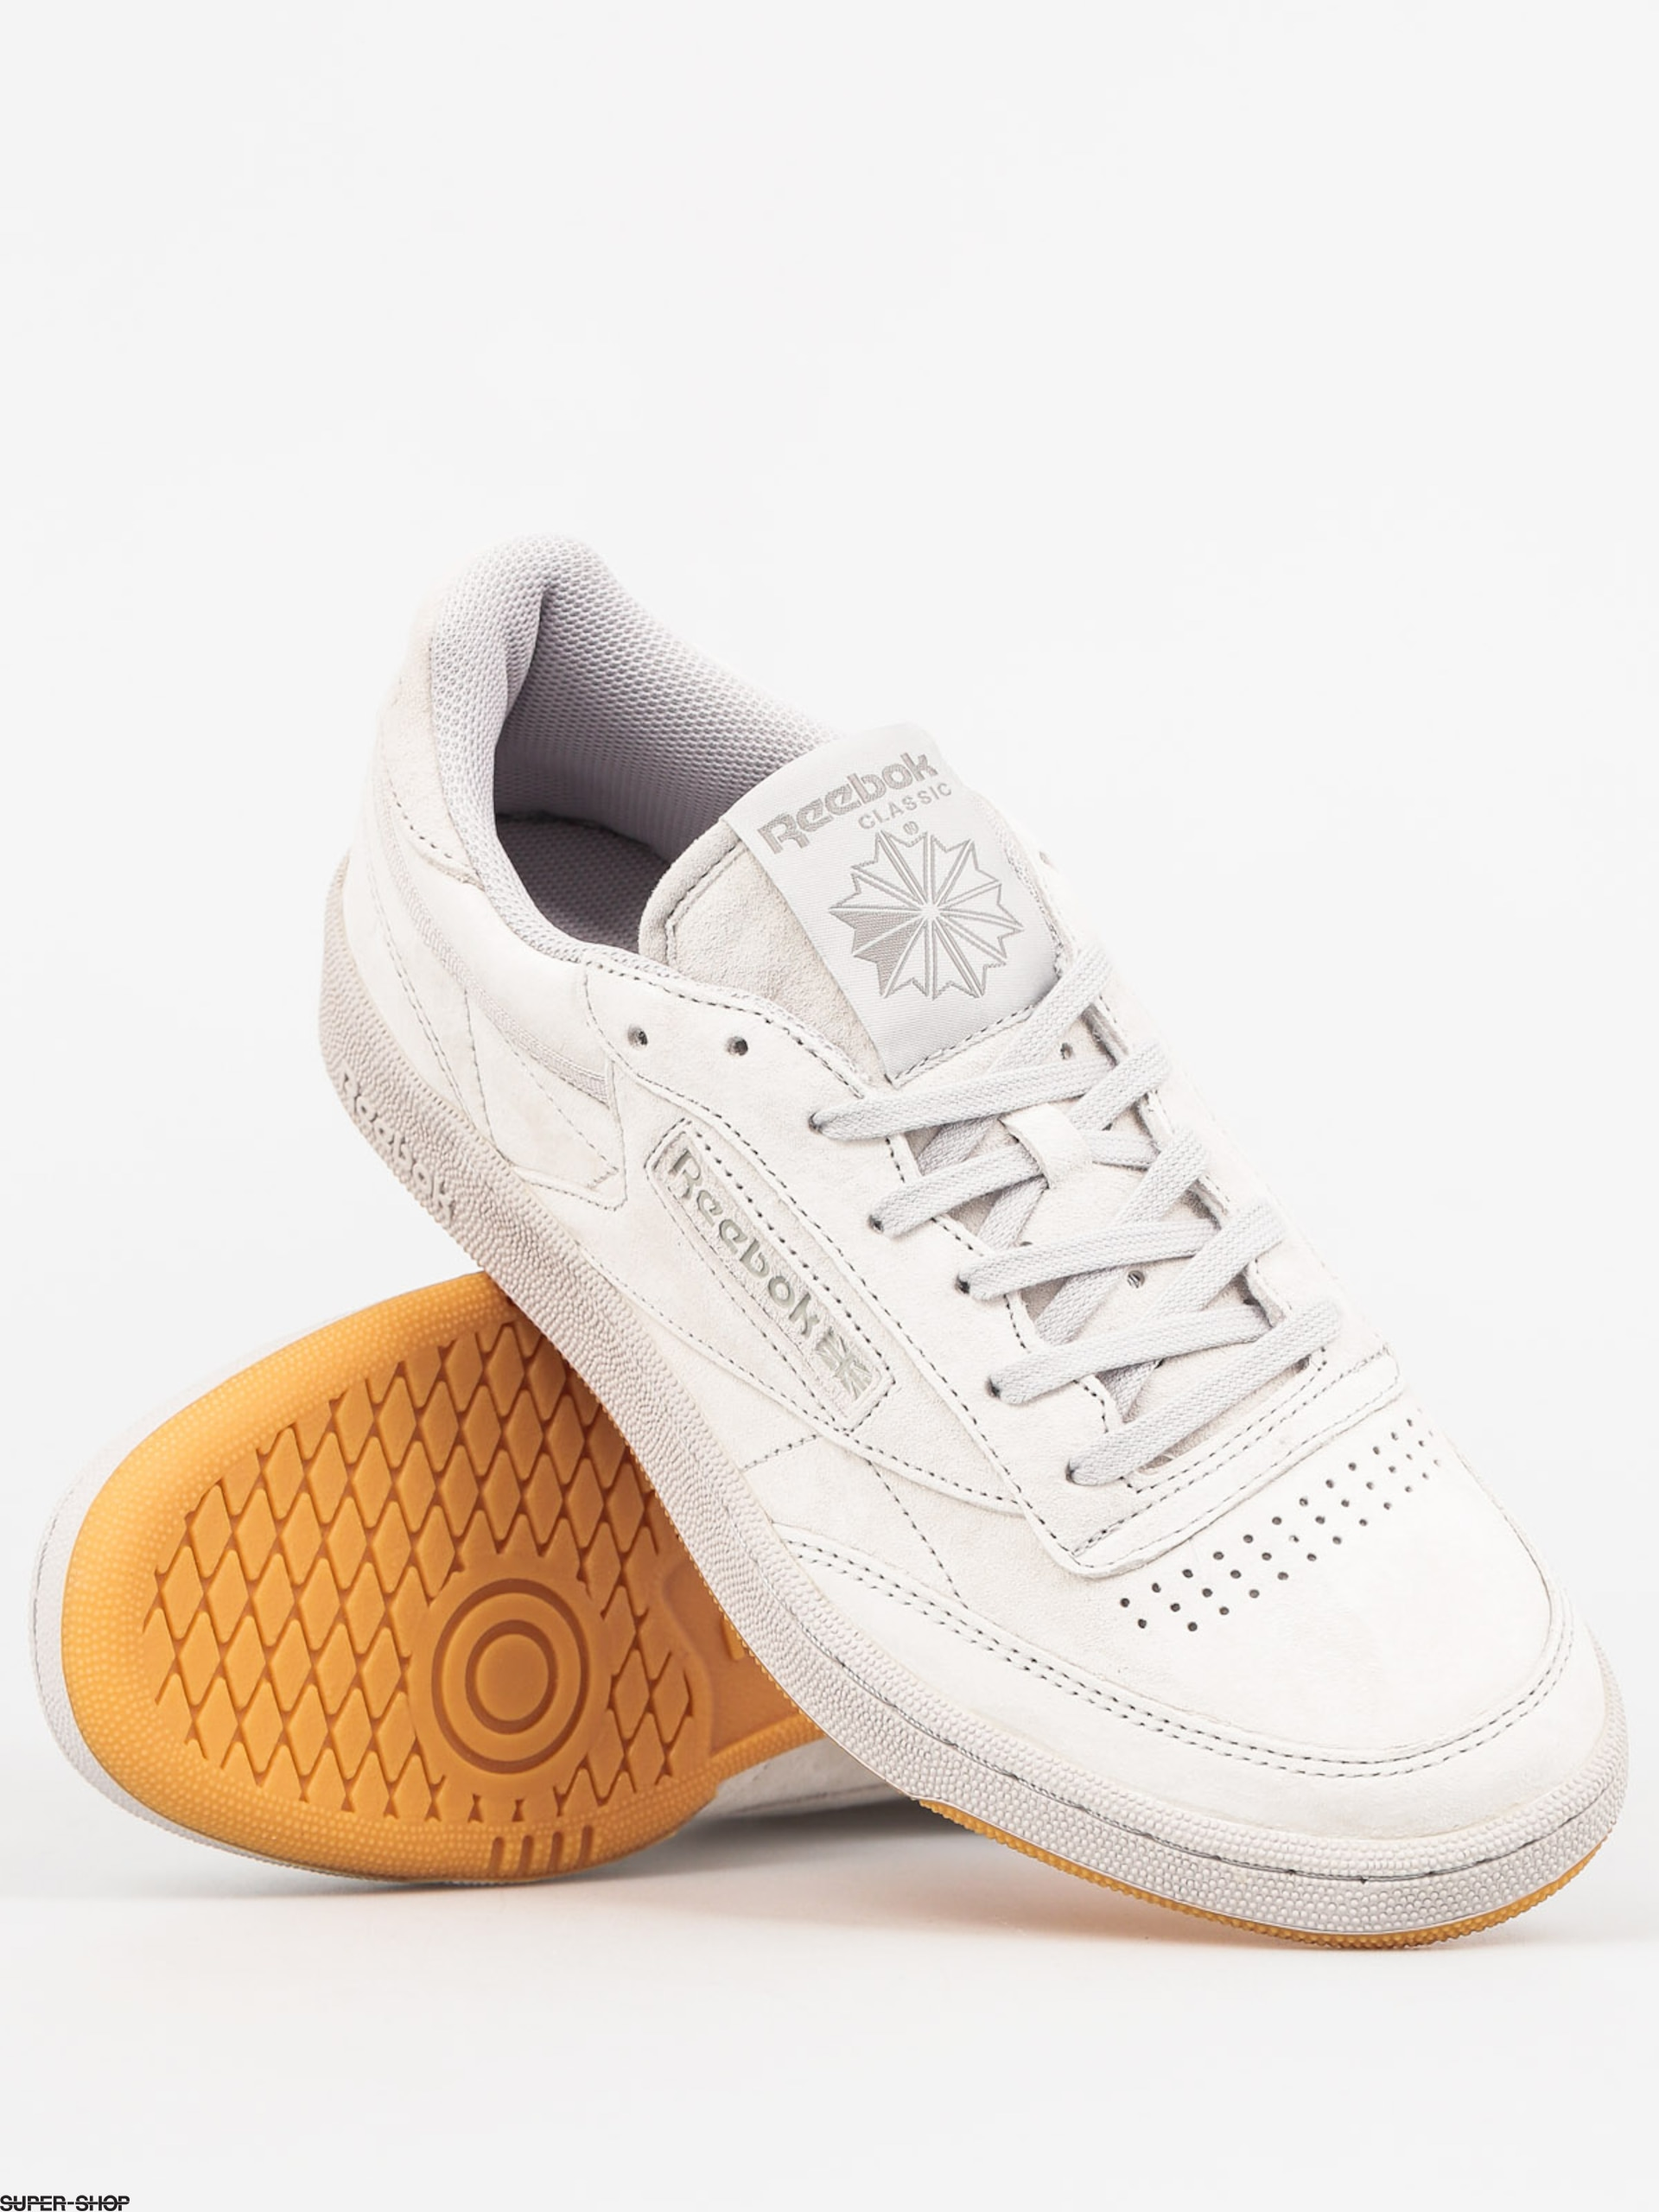 Reebok Shoes Club C 85 Tg Steel Carbon Gum